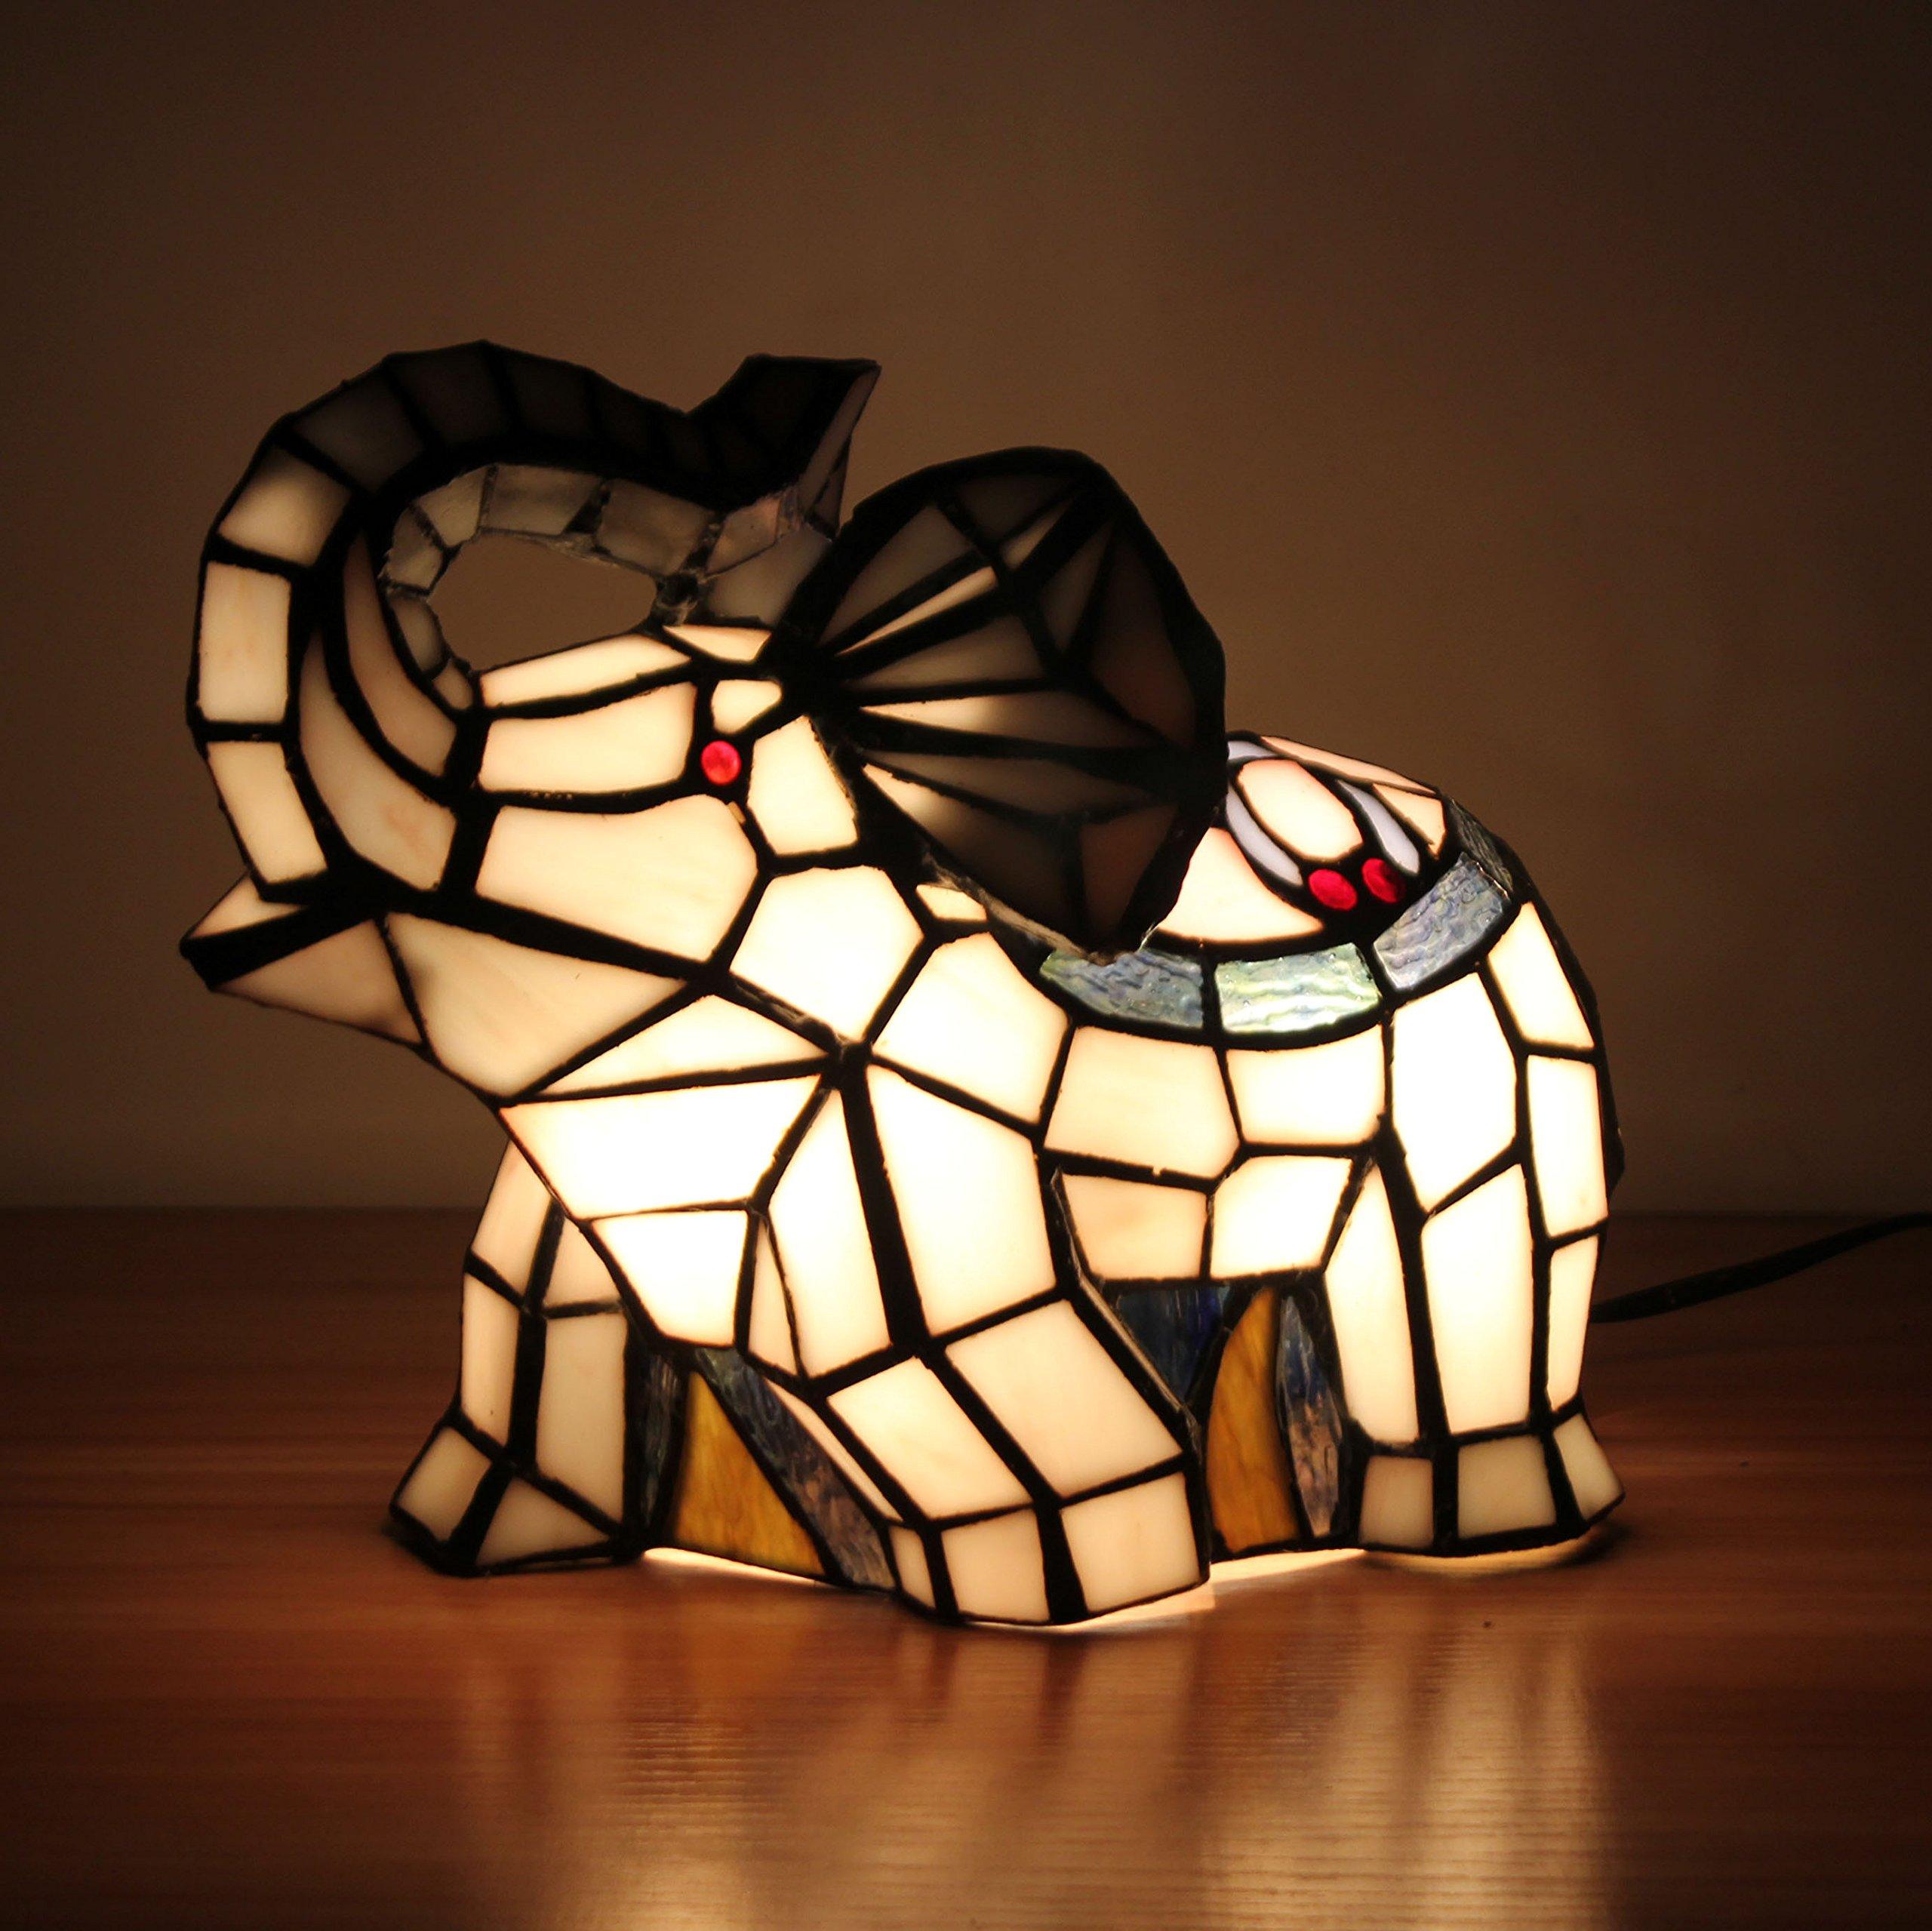 Royal-Tiffany Style Fresh Pastoral White Elephant Table Lamp Children's Lamp Night Light by Animal Night Light (Image #2)